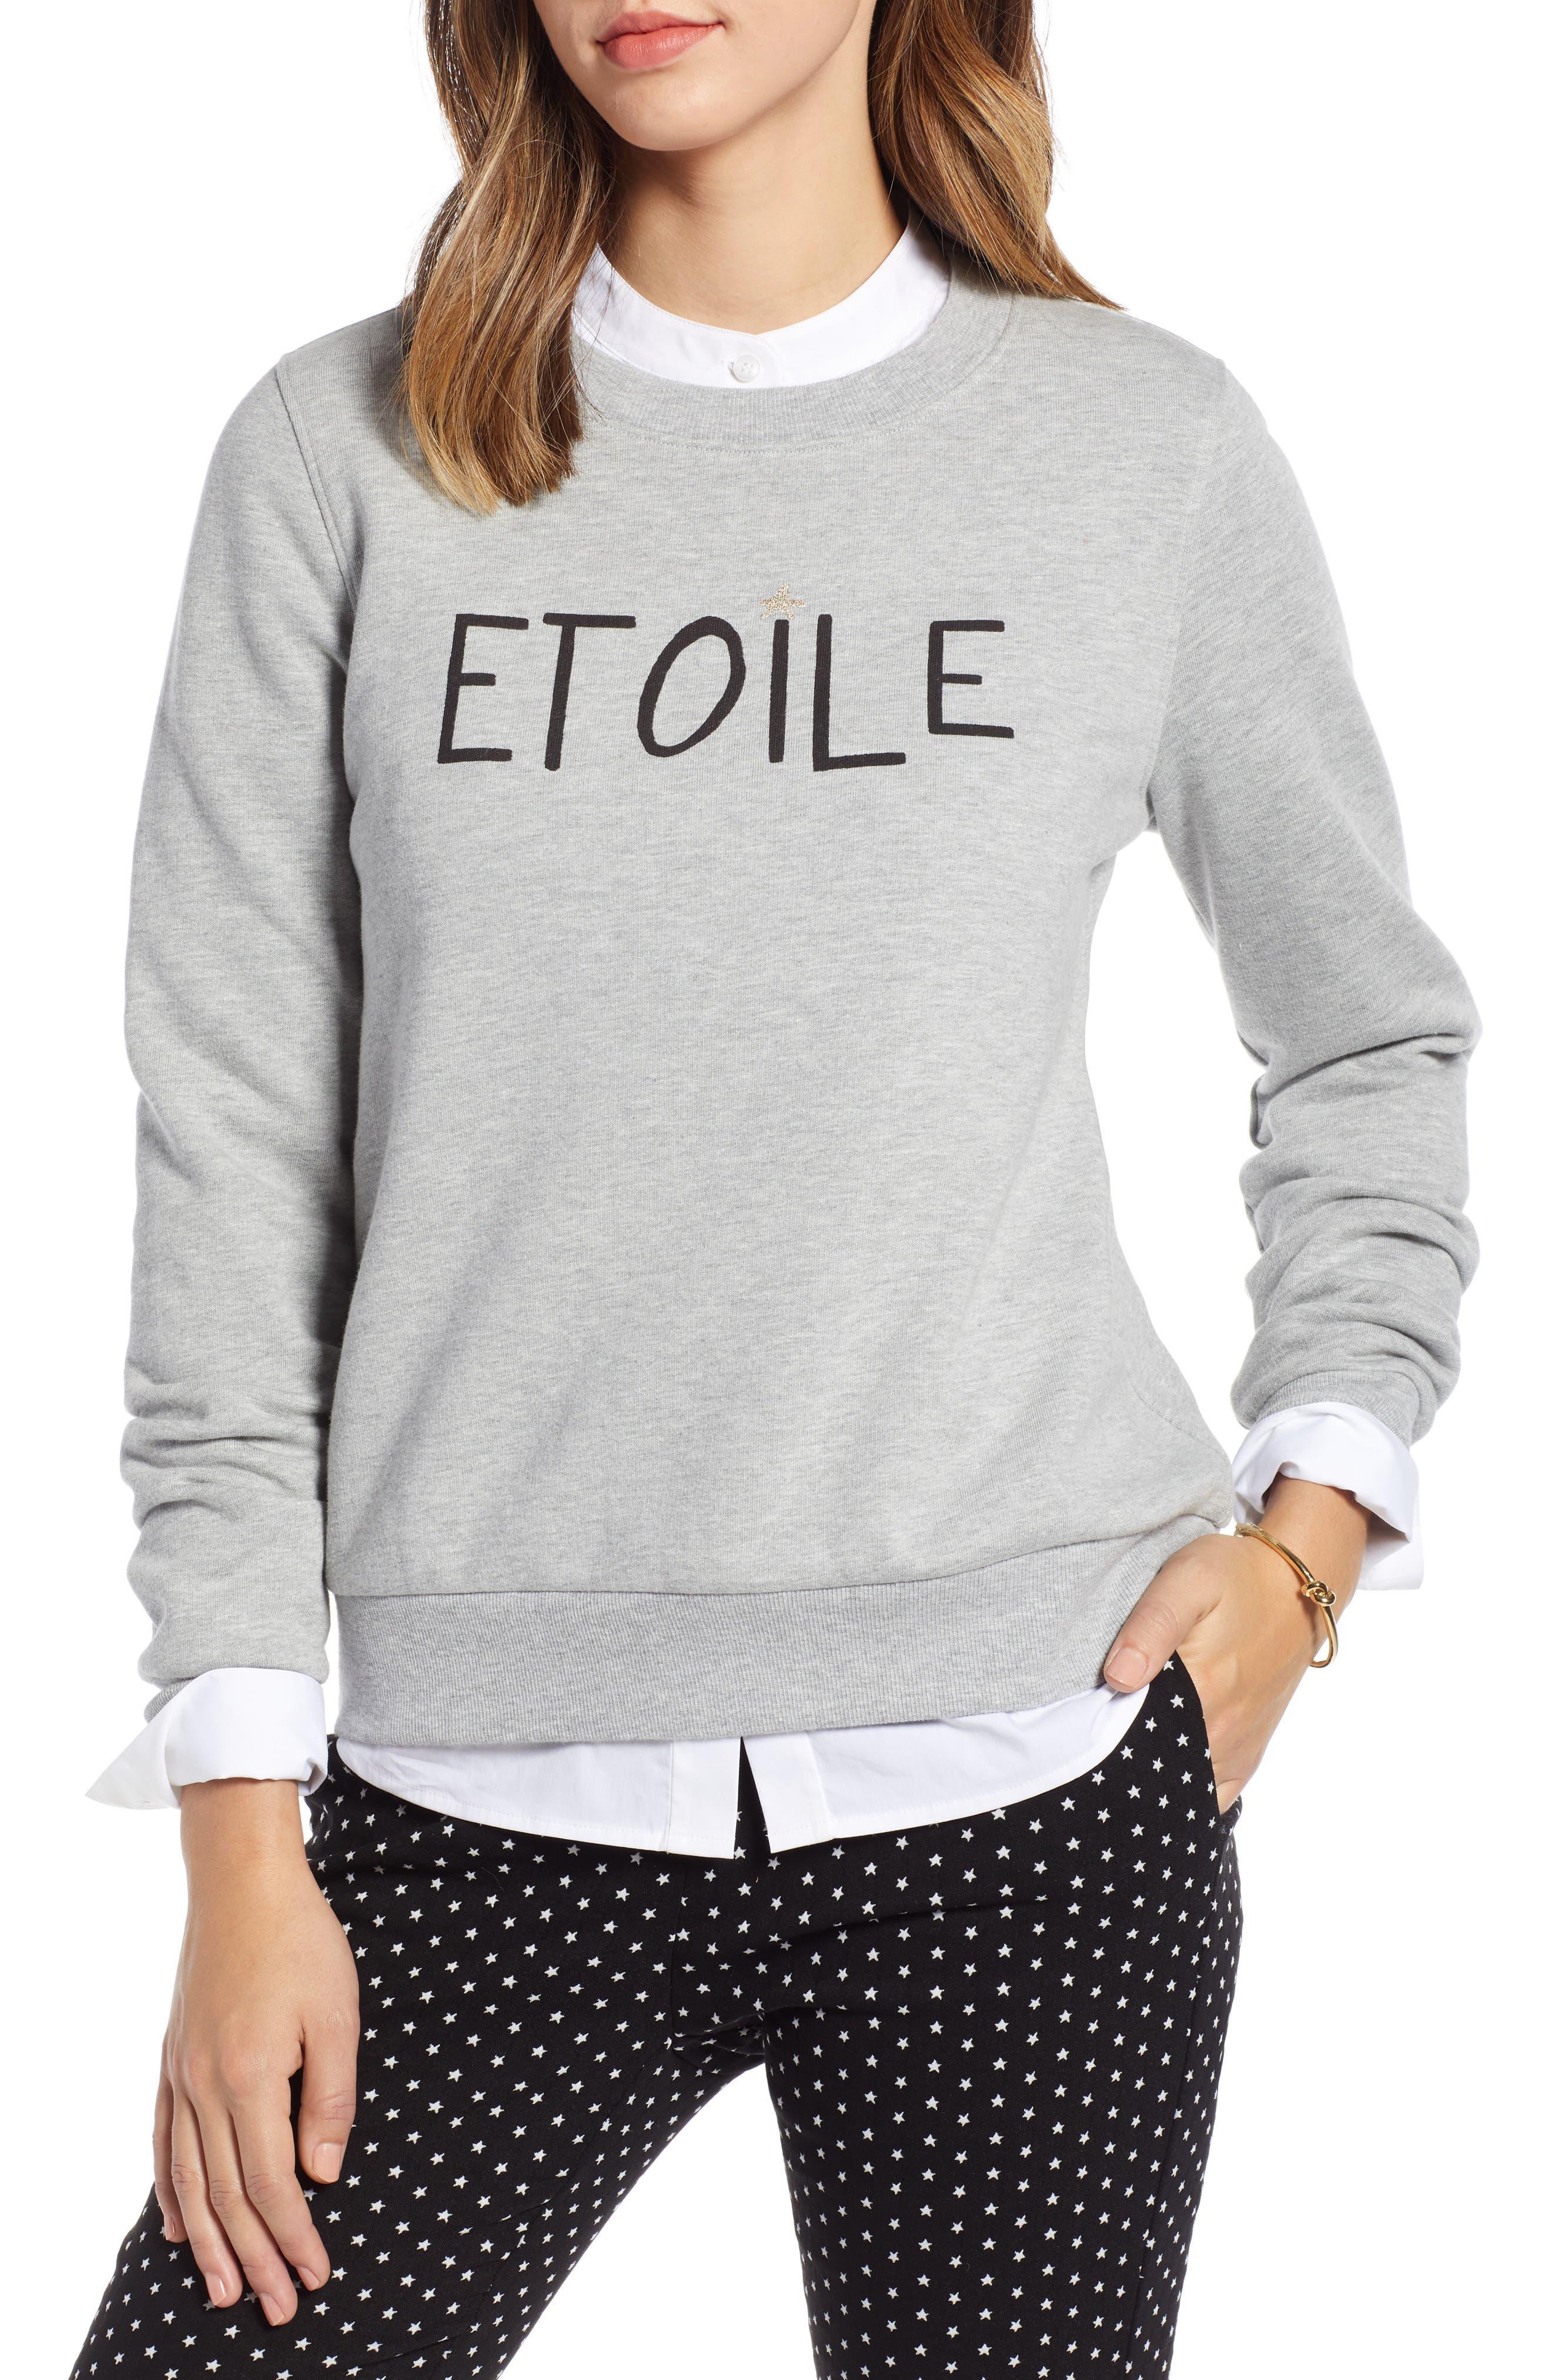 Etoile Sweatshirt, Main, color, 030